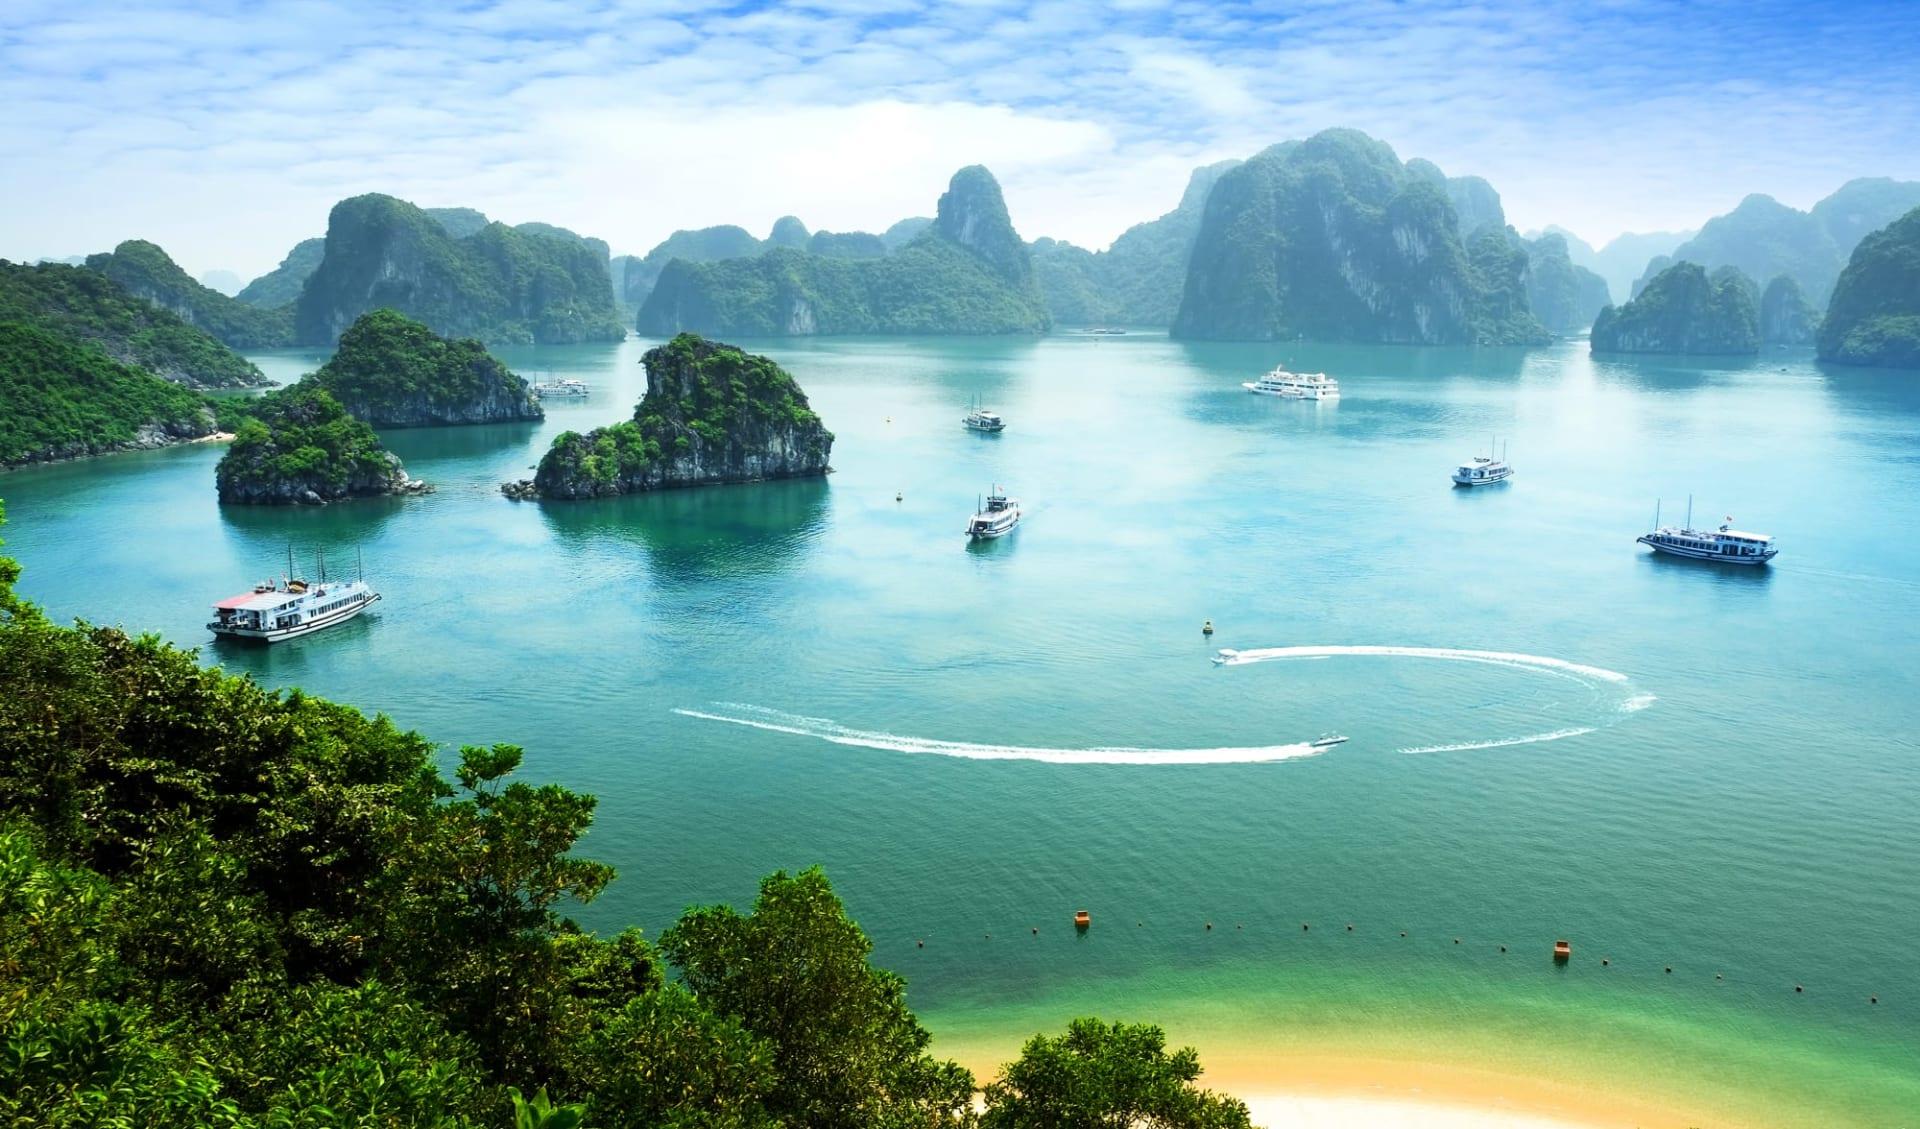 Halong Bucht Kreuzfahrten mit «Bhaya Classic» ab Hanoi: Halong Bay